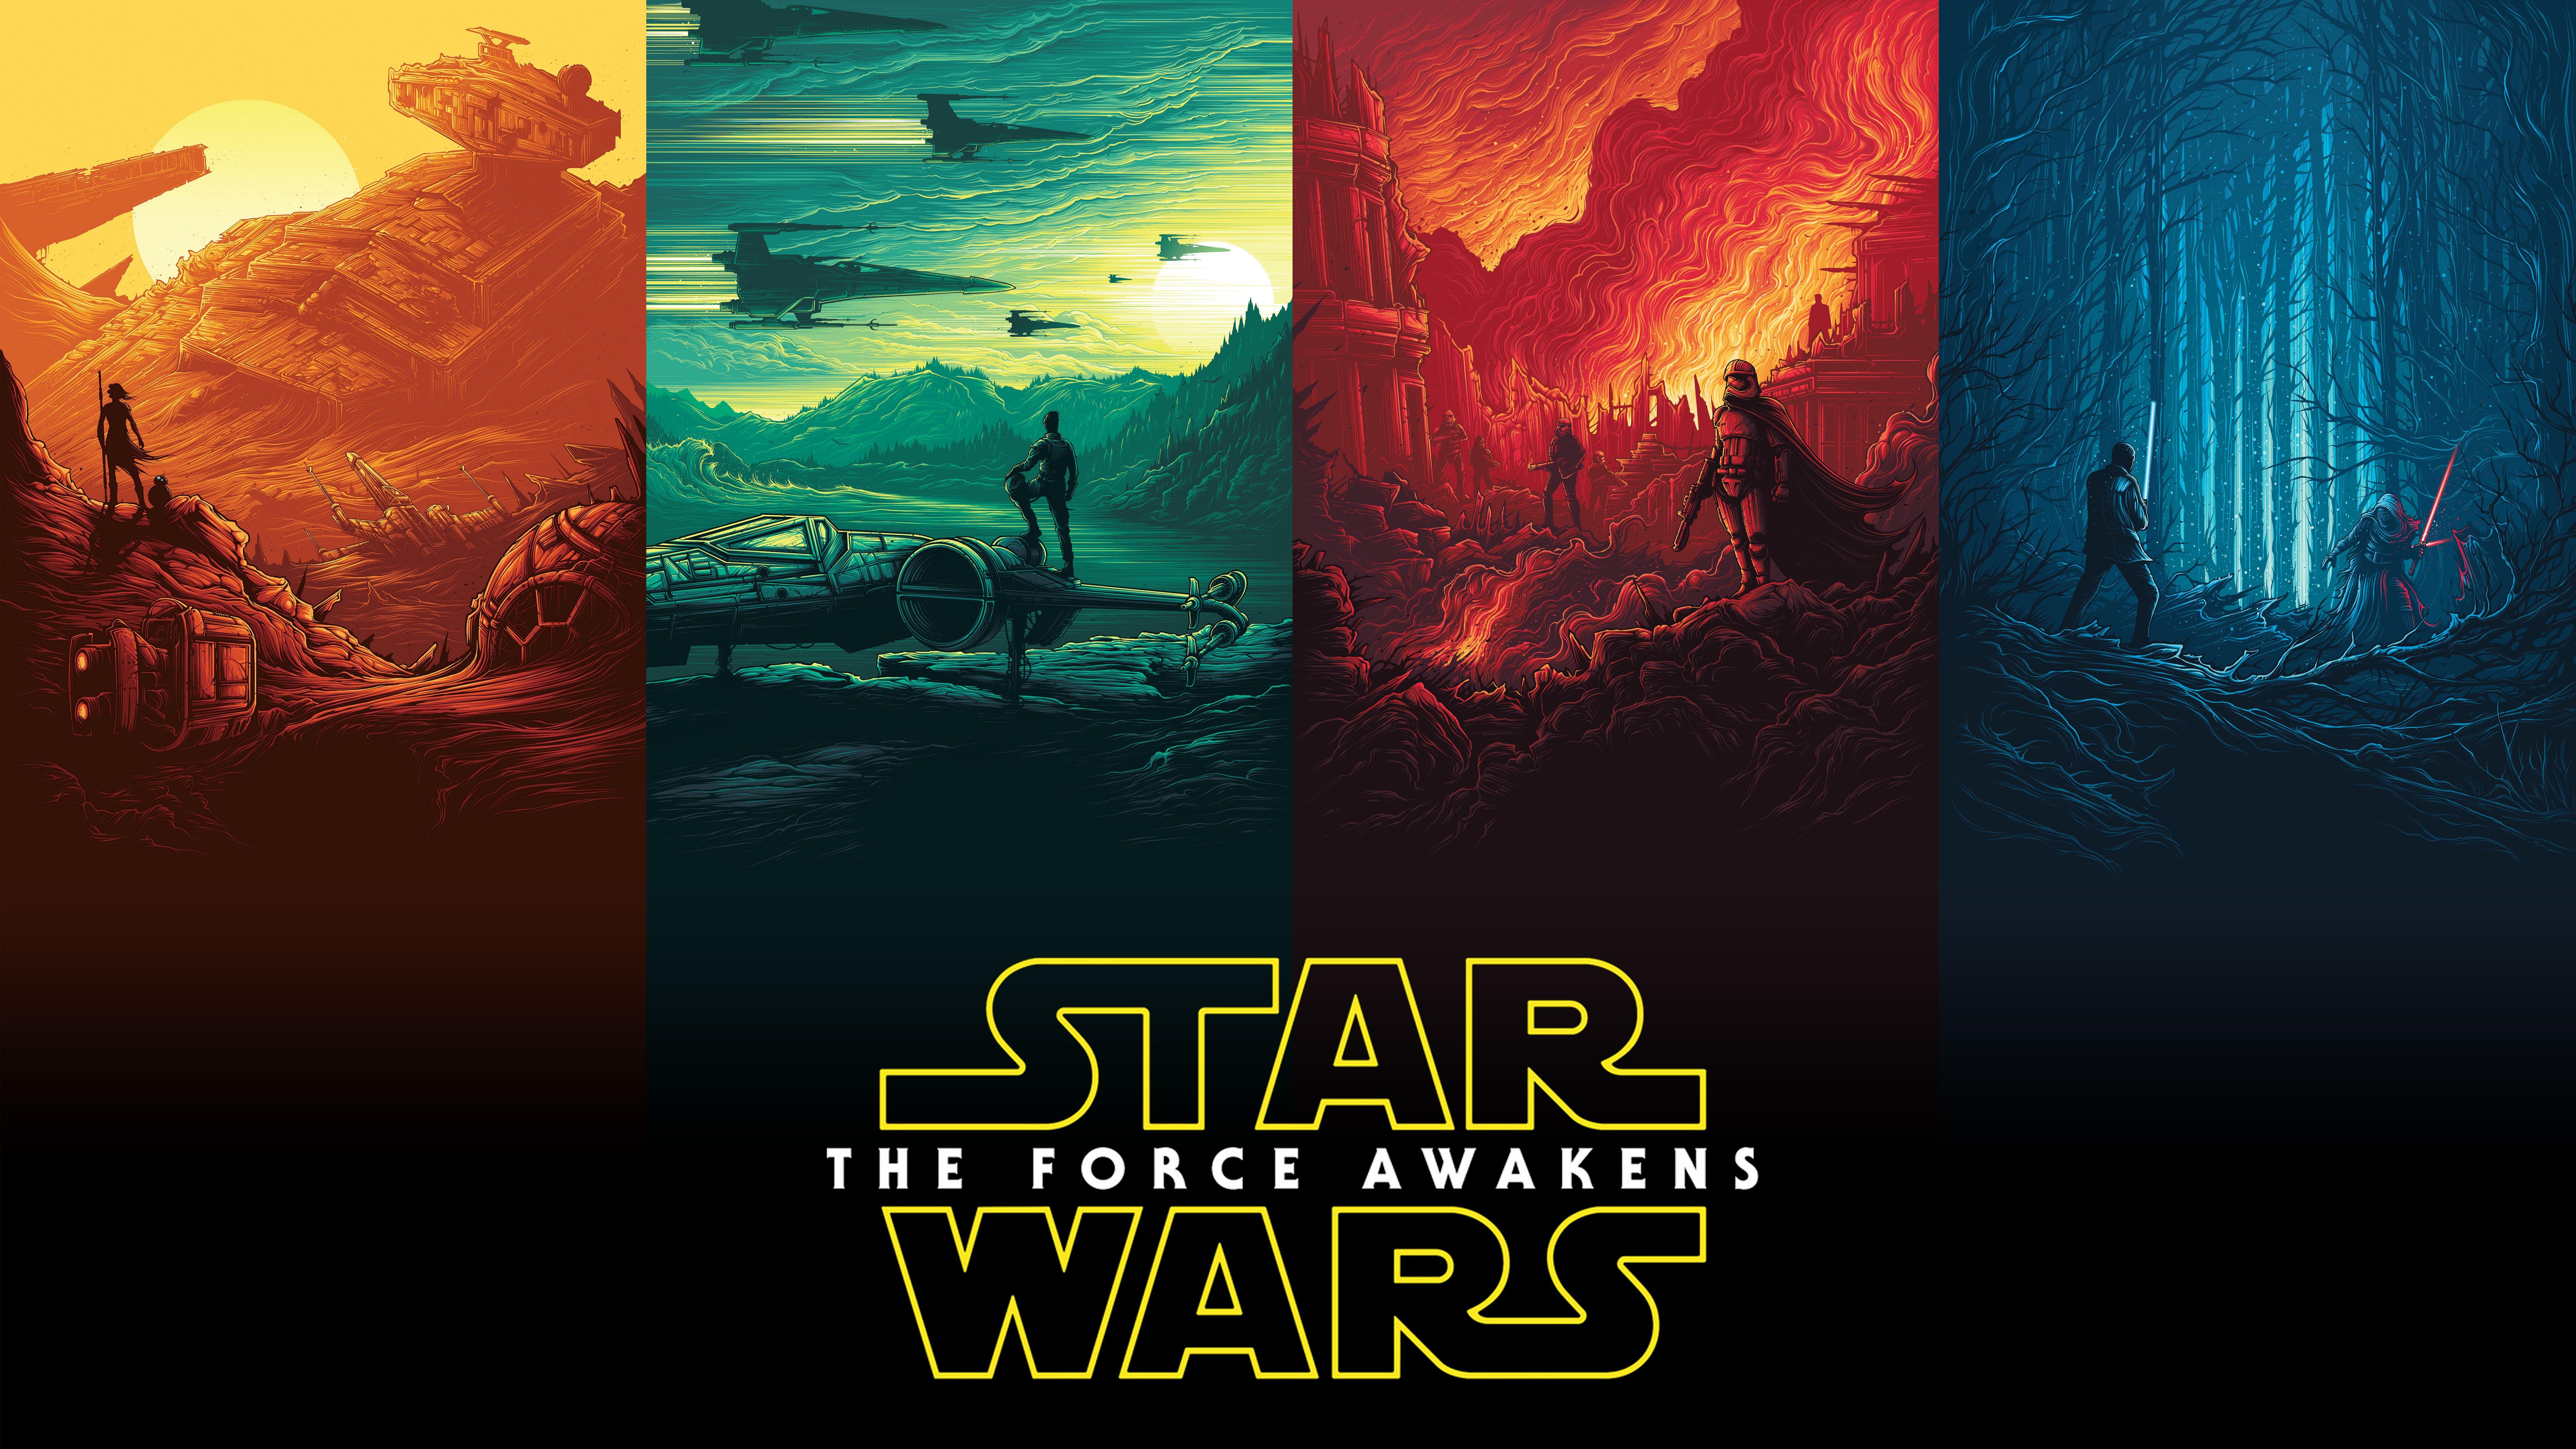 Starwars Wallpaper Cellphone: Star Wars Wallpapers Mobile For Wallpaper Background